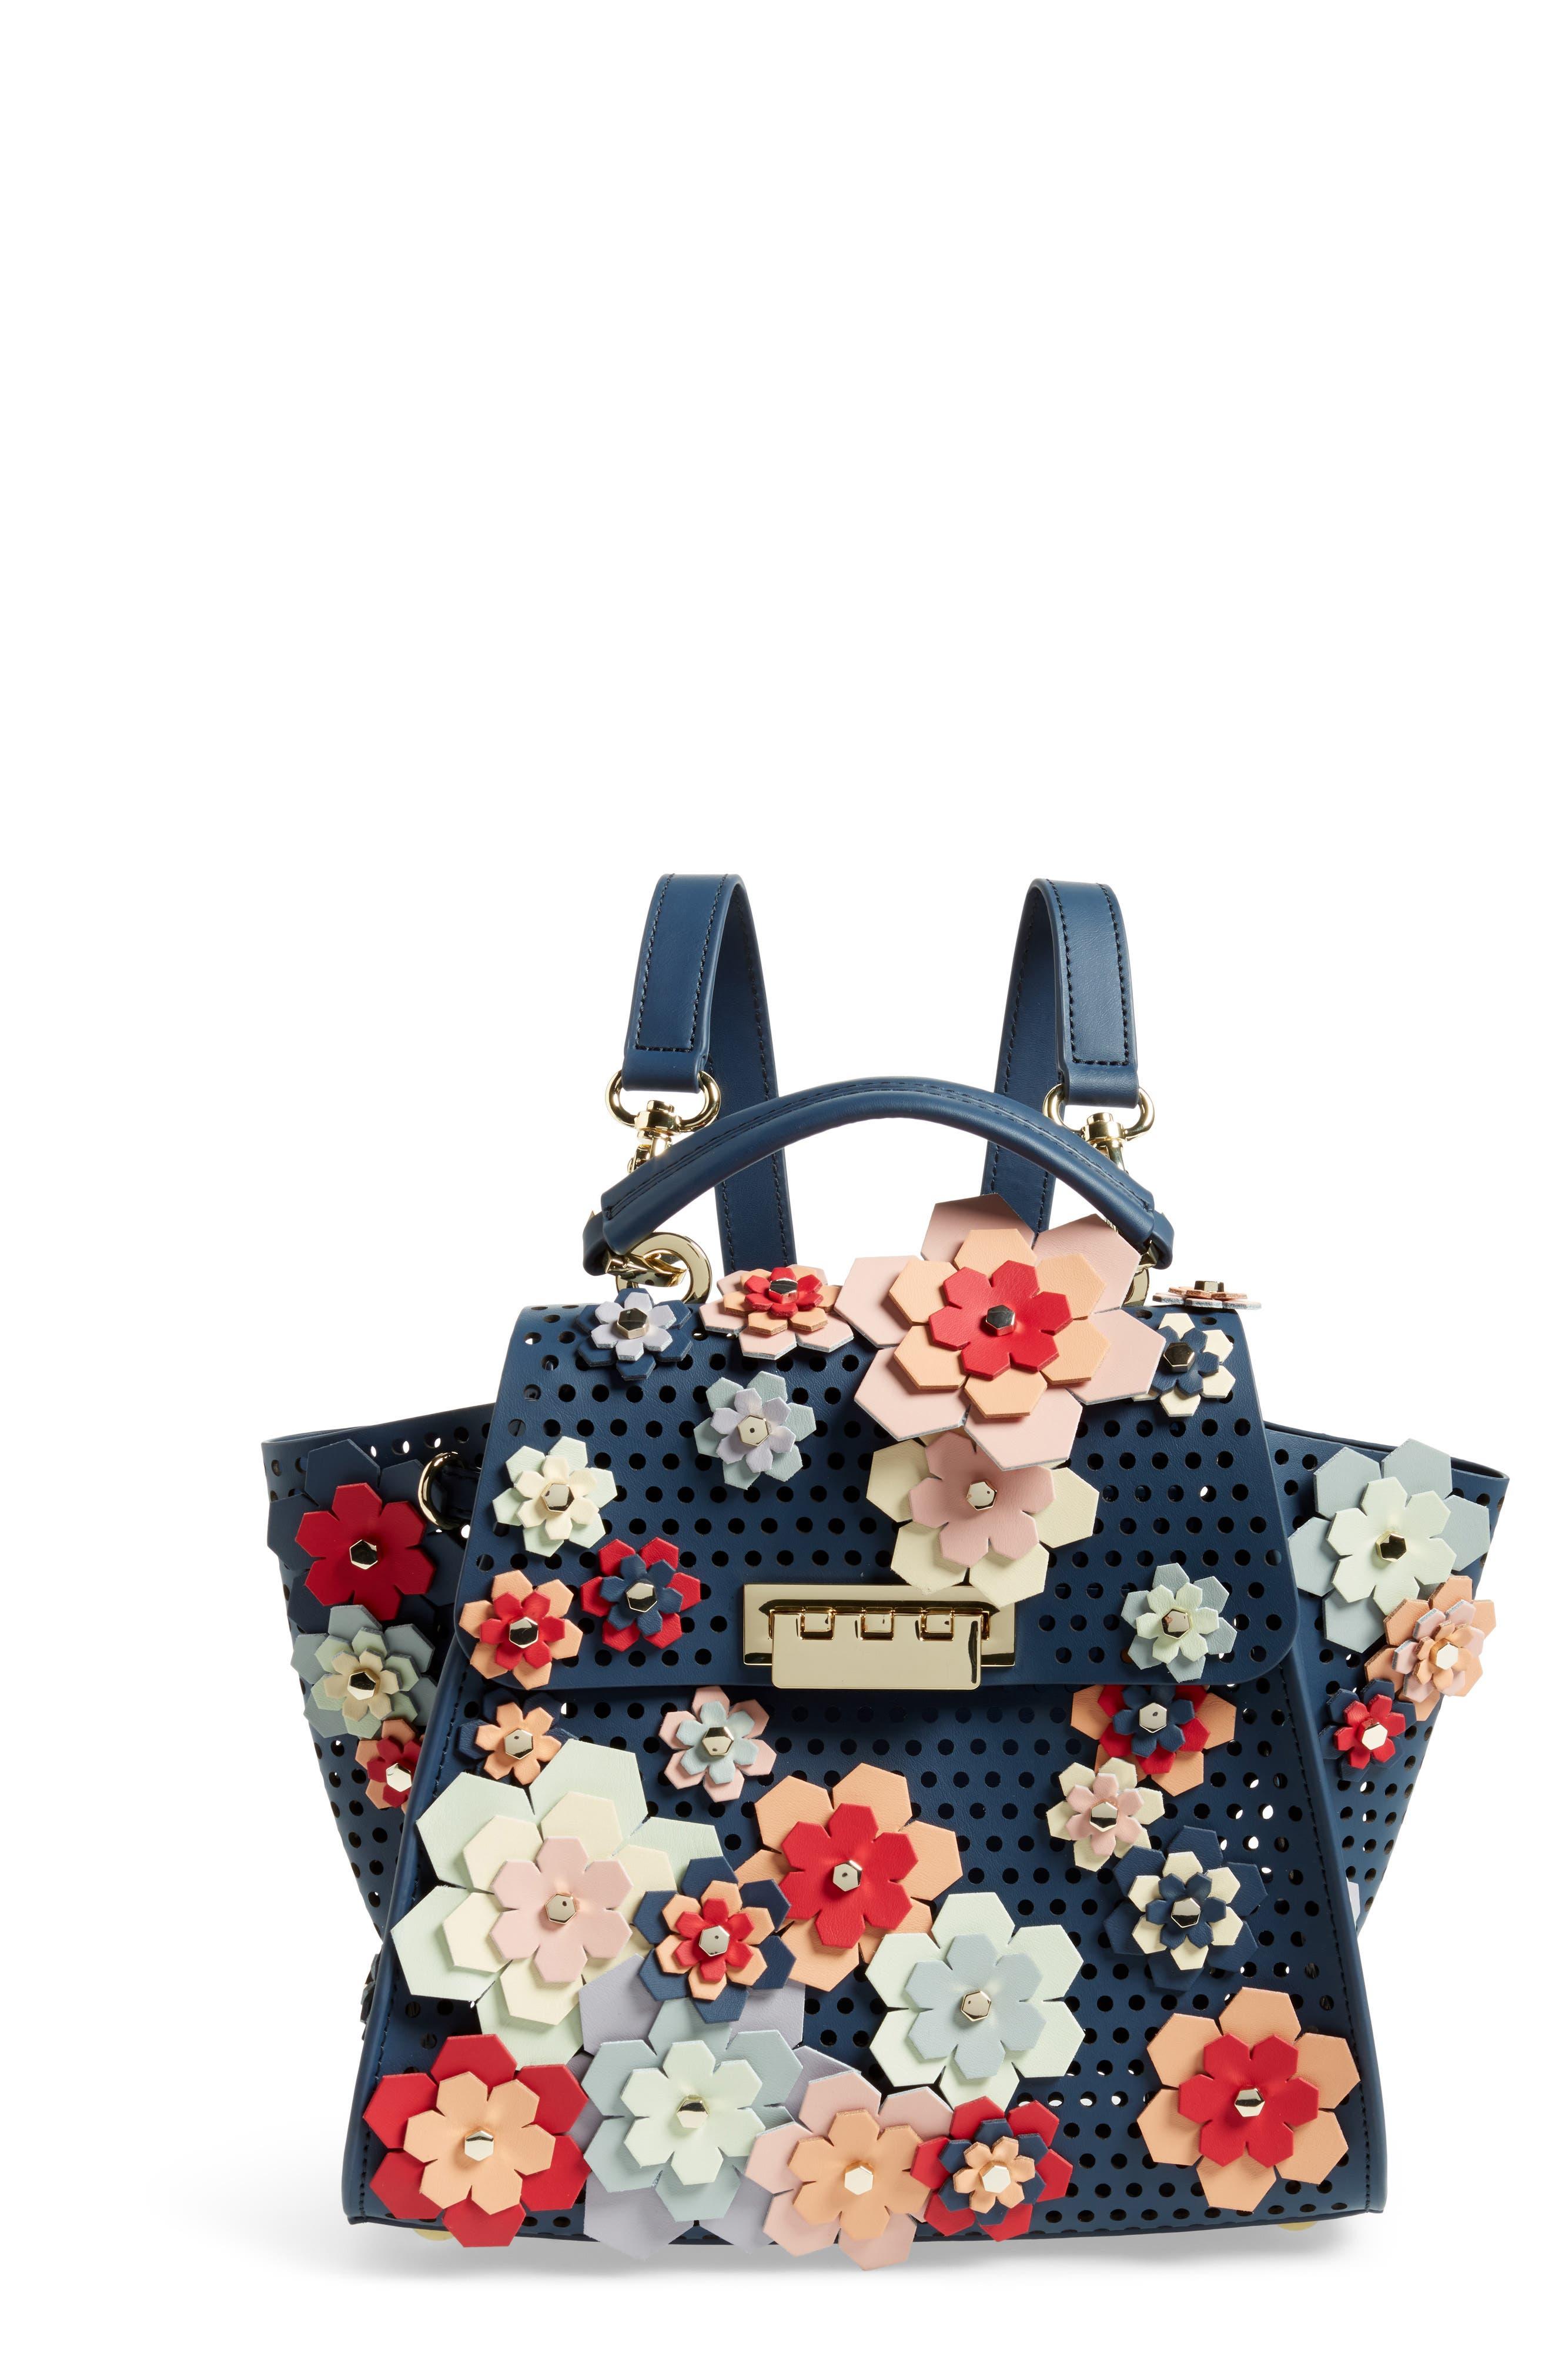 Eartha Kit Convertible Calfskin Leather Backpack,                             Main thumbnail 1, color,                             Blue/ Rainbow